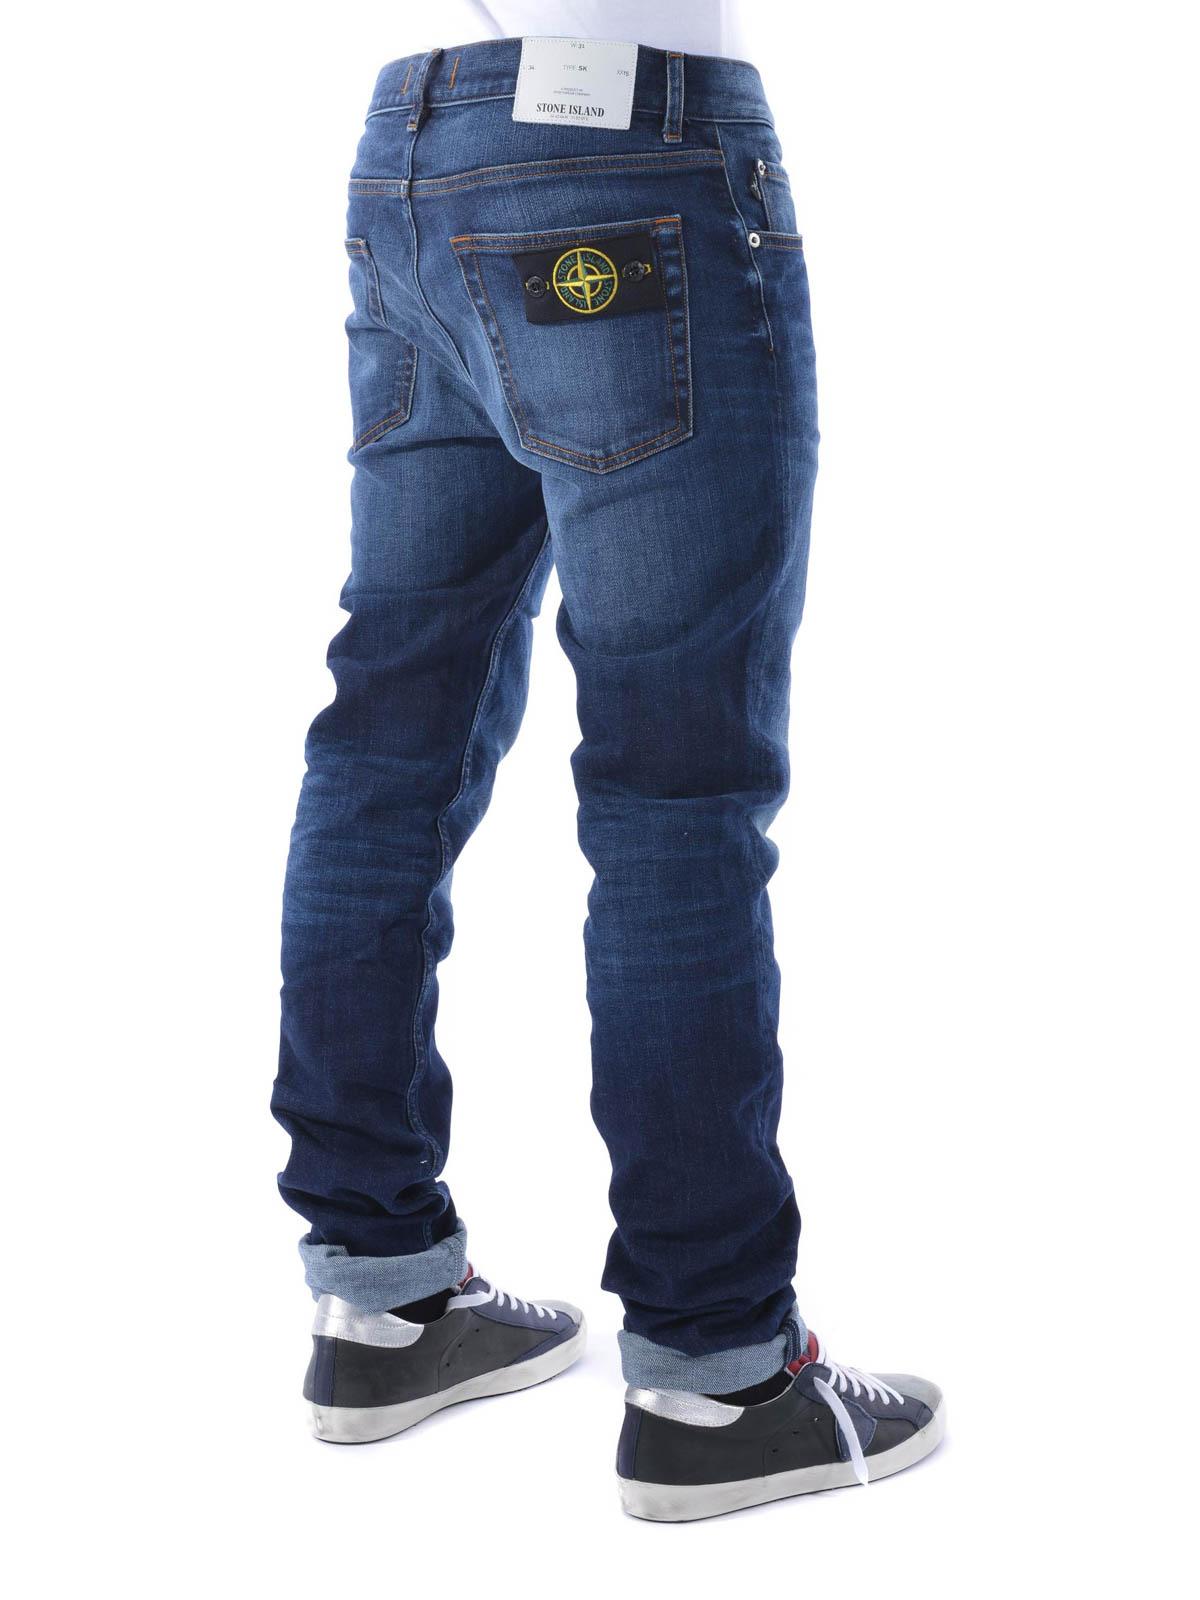 REAL skinny jeans by Stone Island - skinny jeans | iKRIX